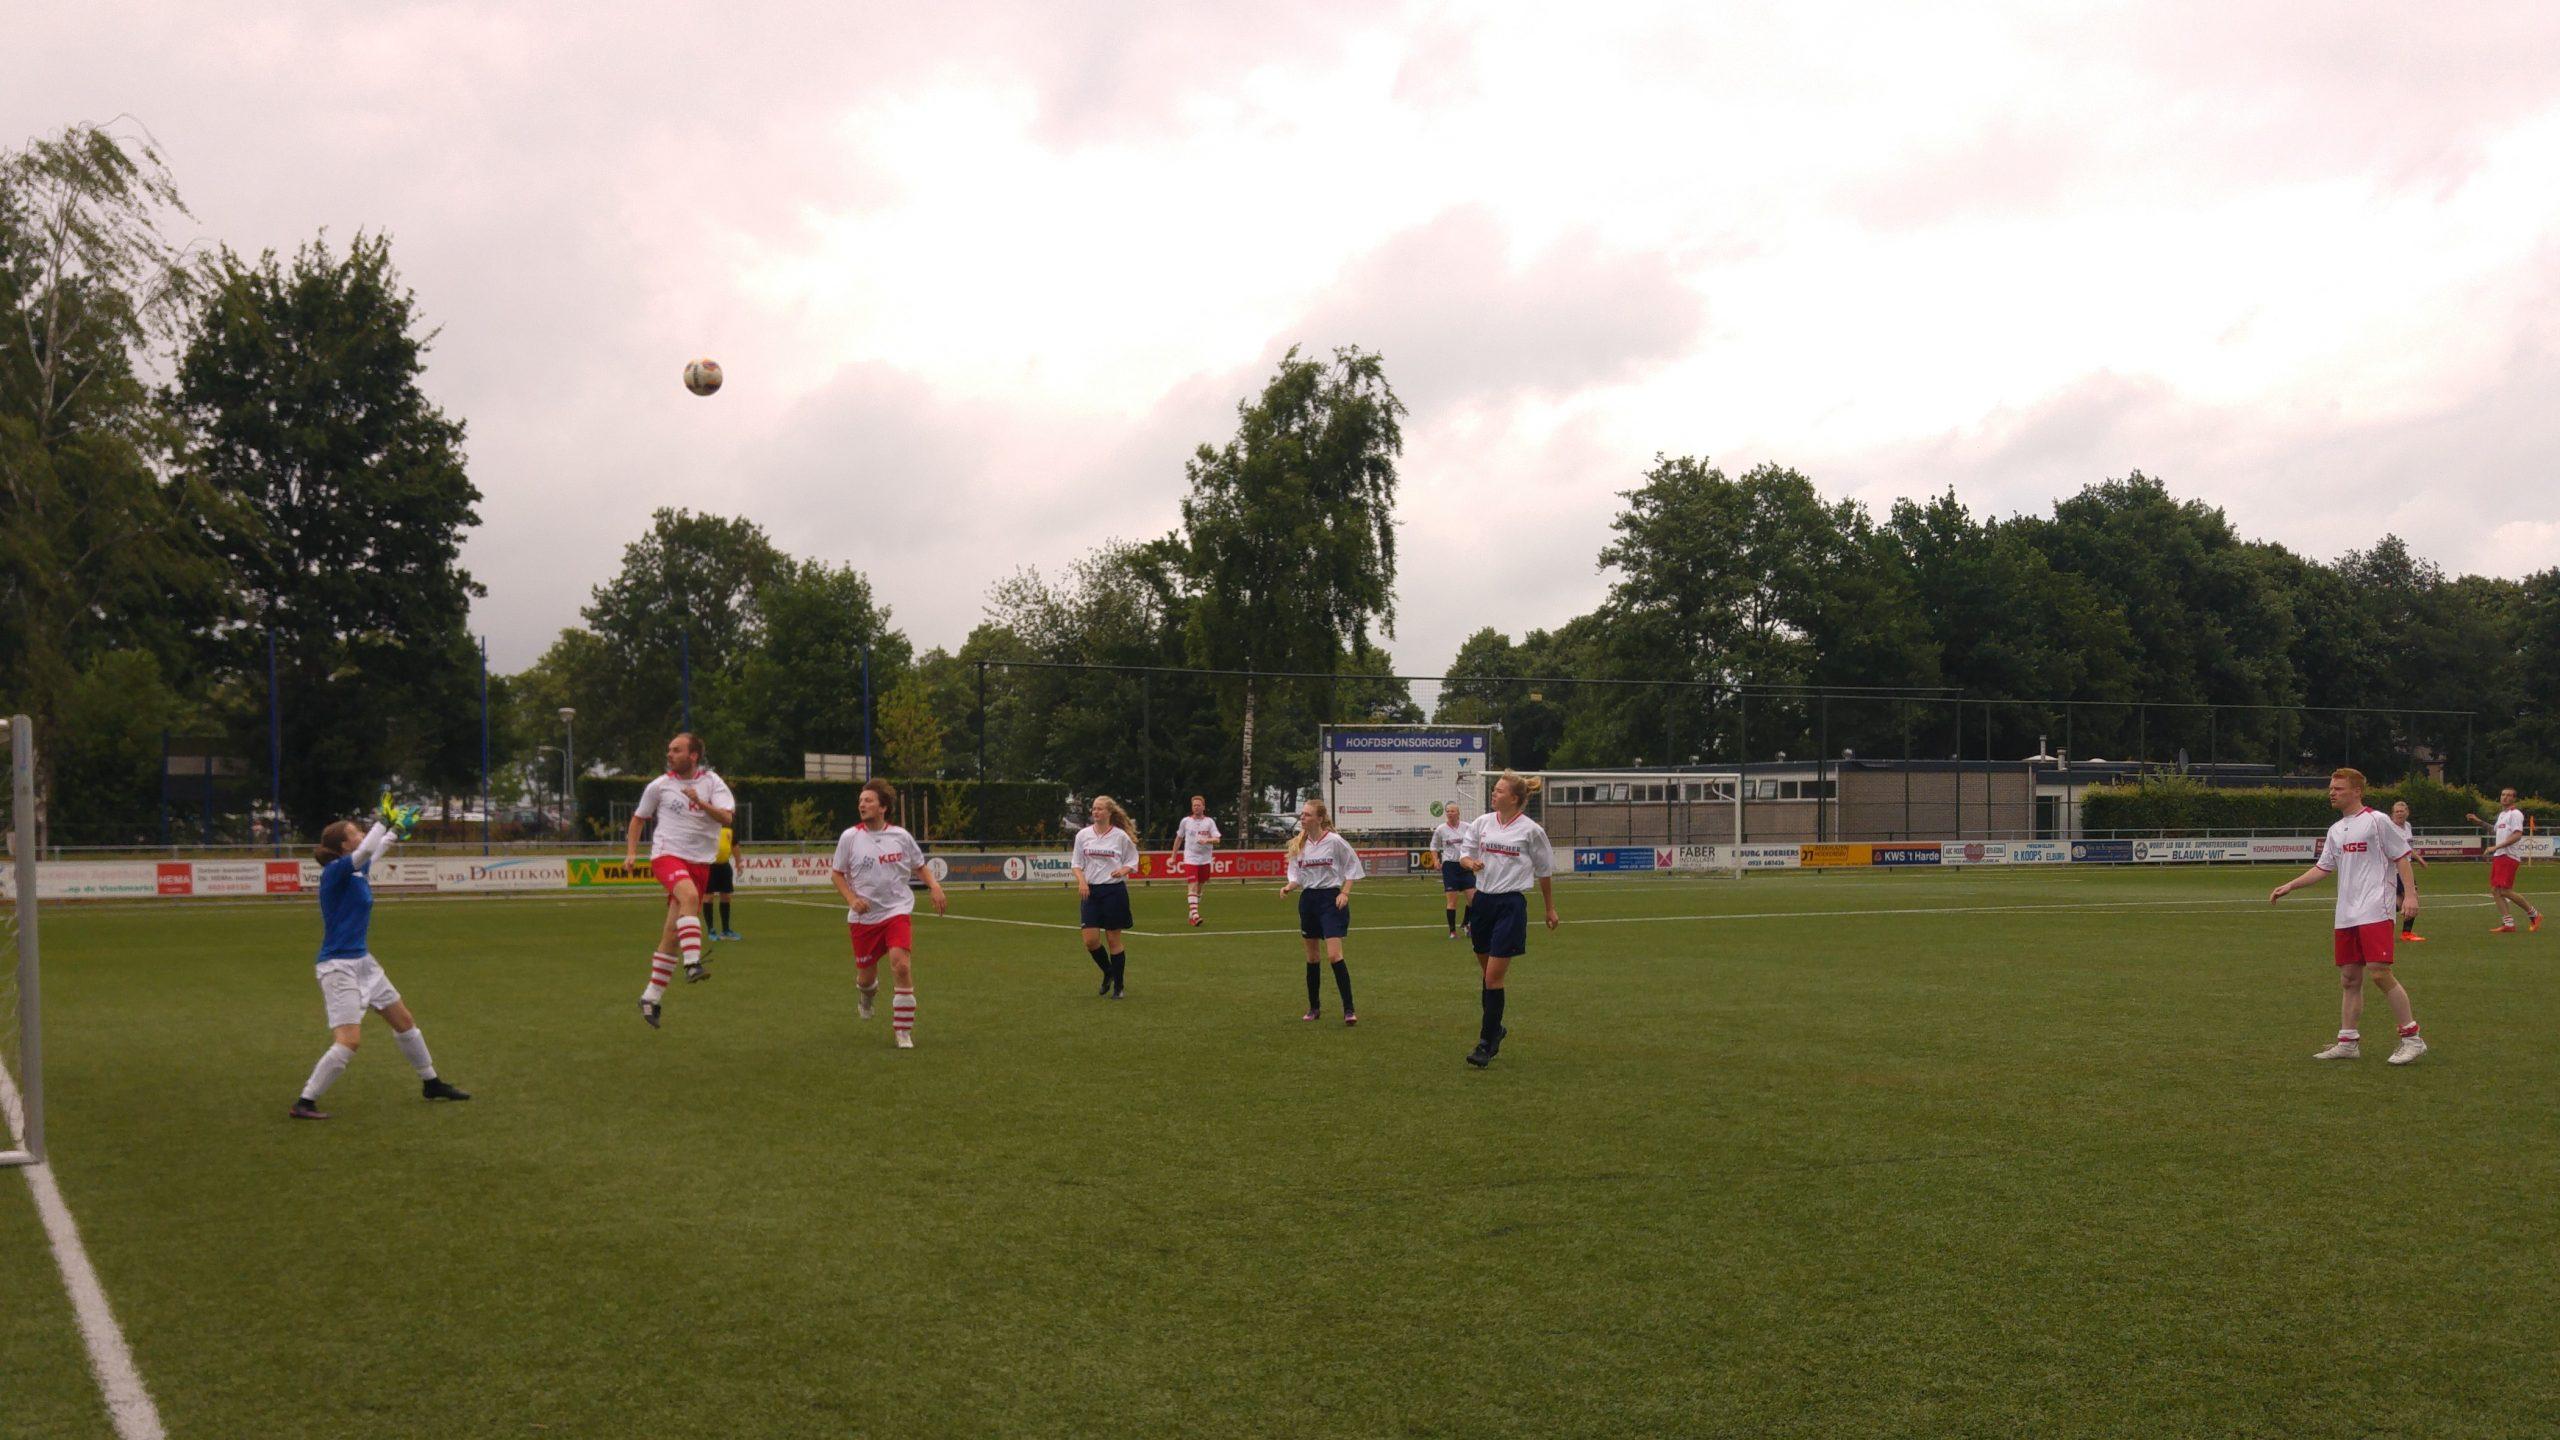 Sponsortoernooi Elburger Sportclub weer succesvol - Elburger SC